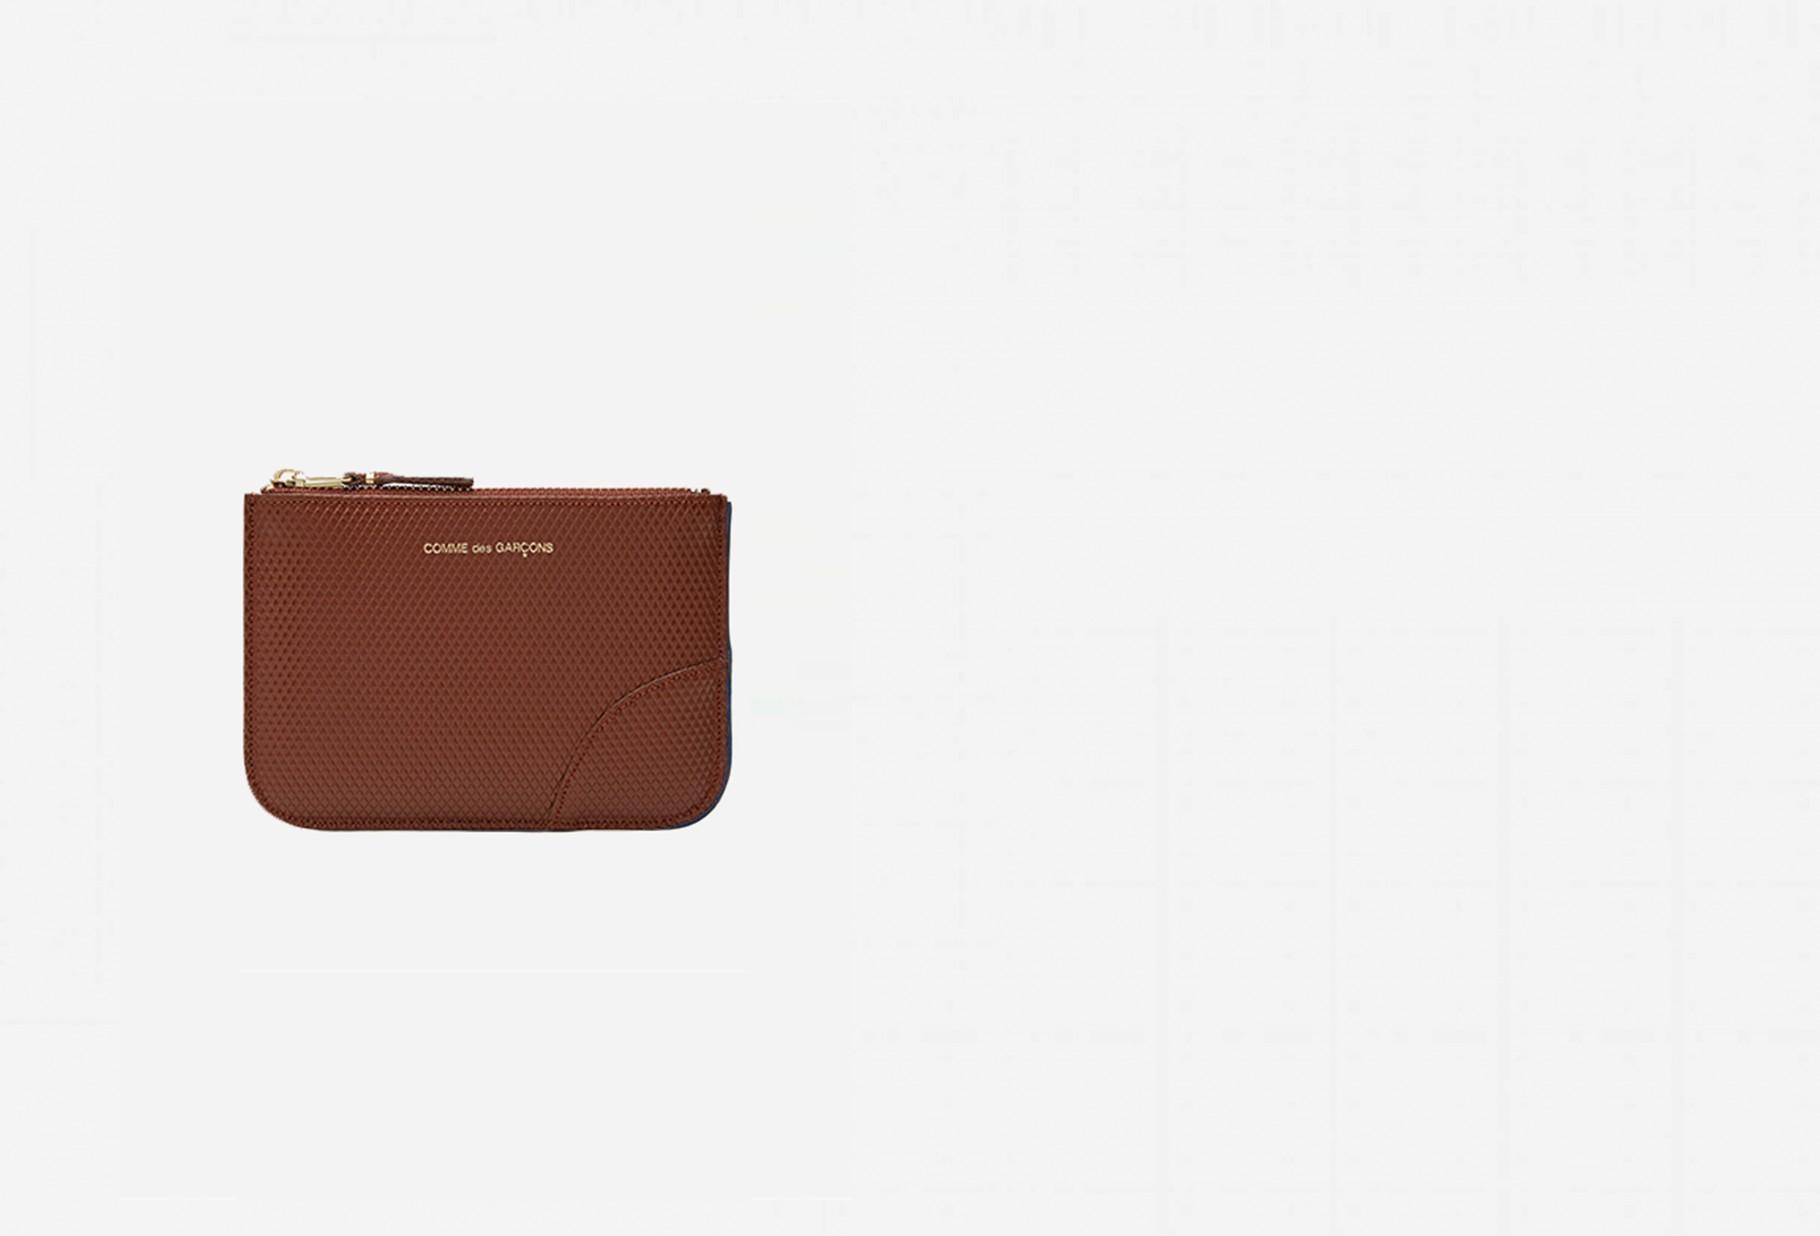 COMME DES GARÇONS WALLETS / Cdg luxury group sa8100g Brown